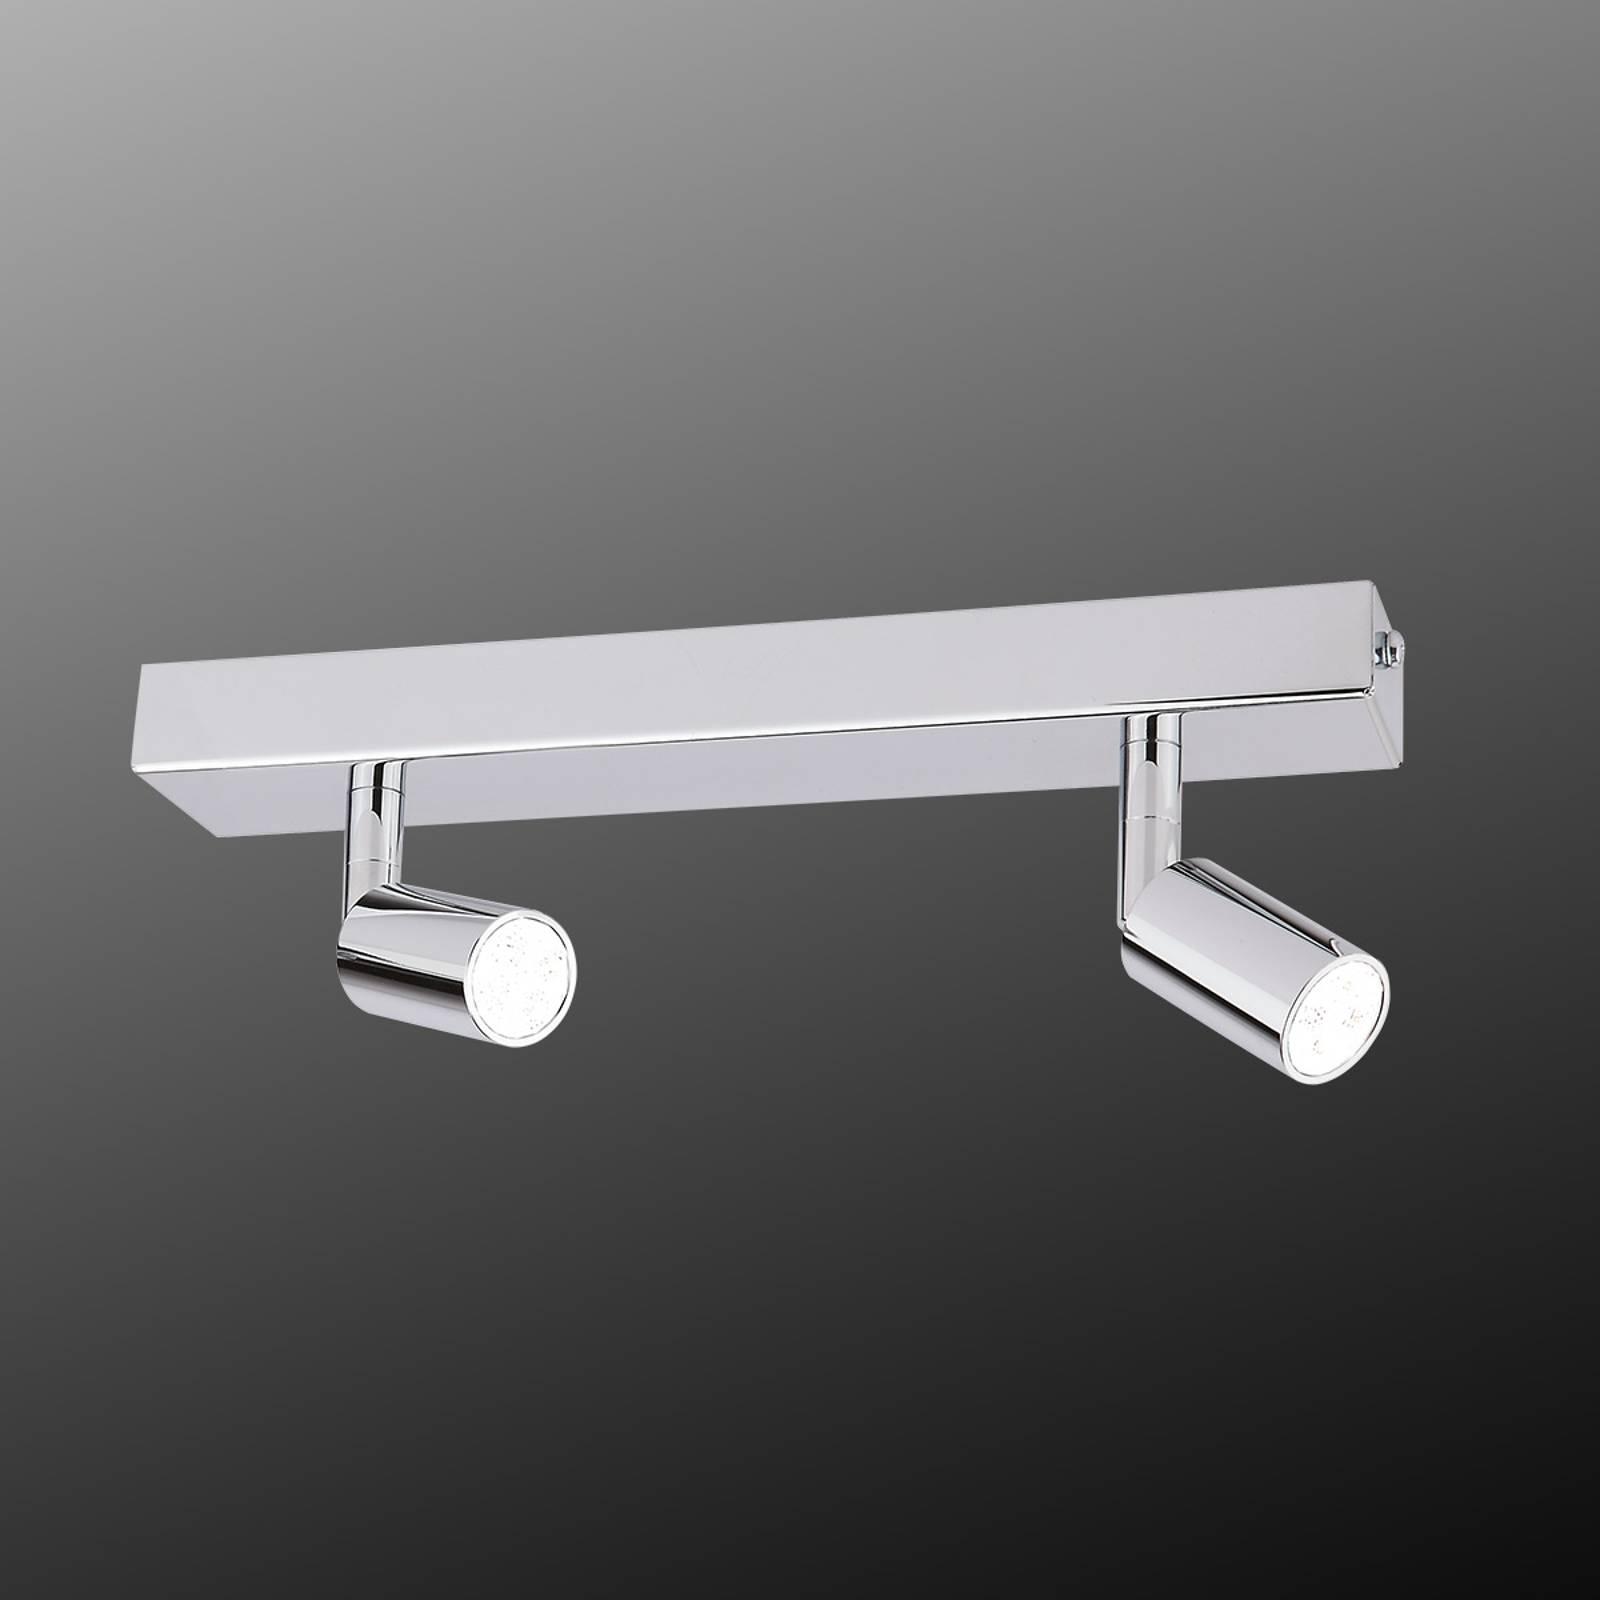 Moderni LED-kattovalaisin, 2-lamppuinen